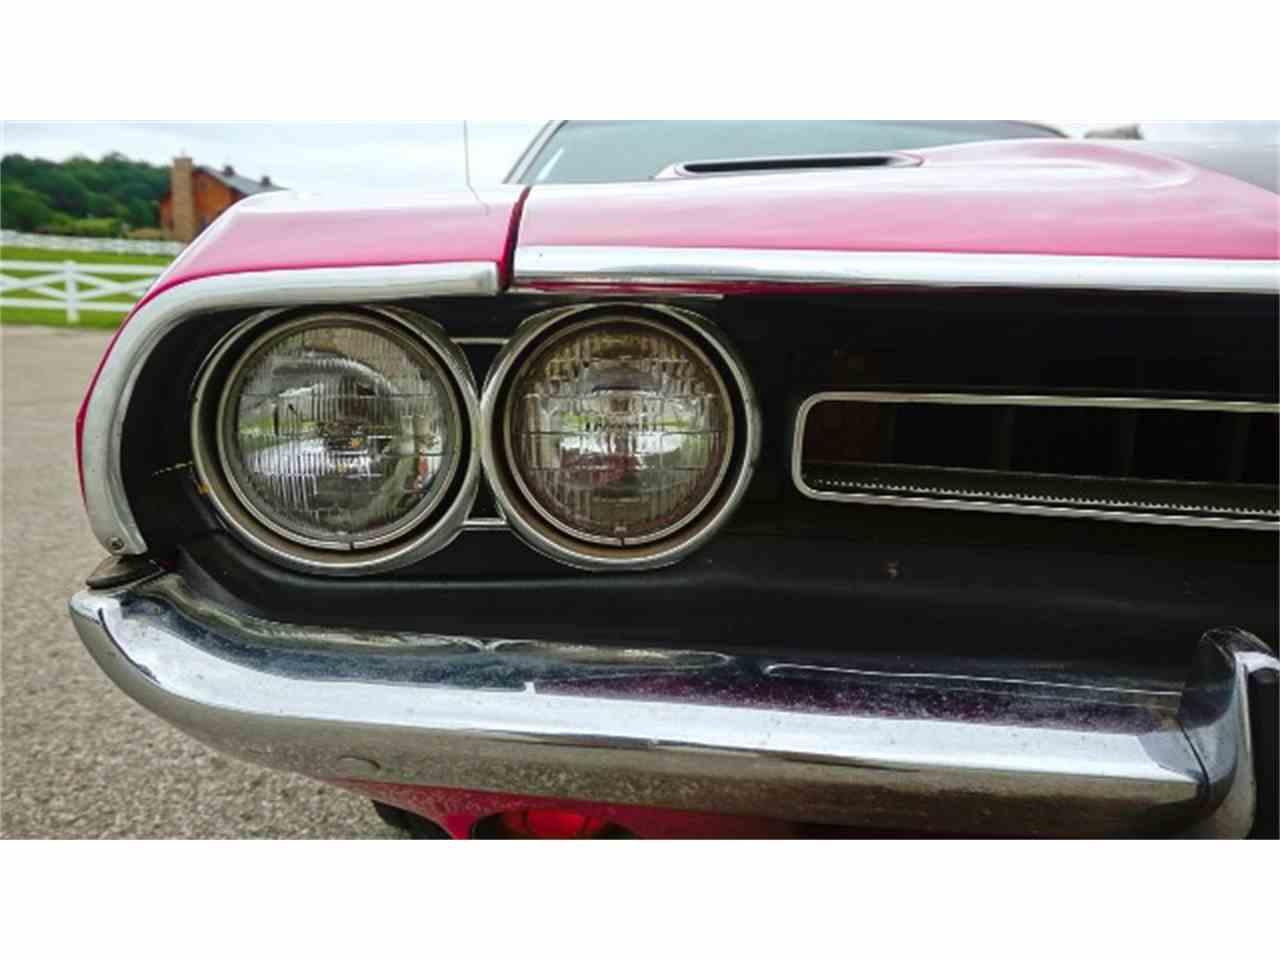 1971 Dodge Challenger For Sale Classiccars Com Cc 1010631